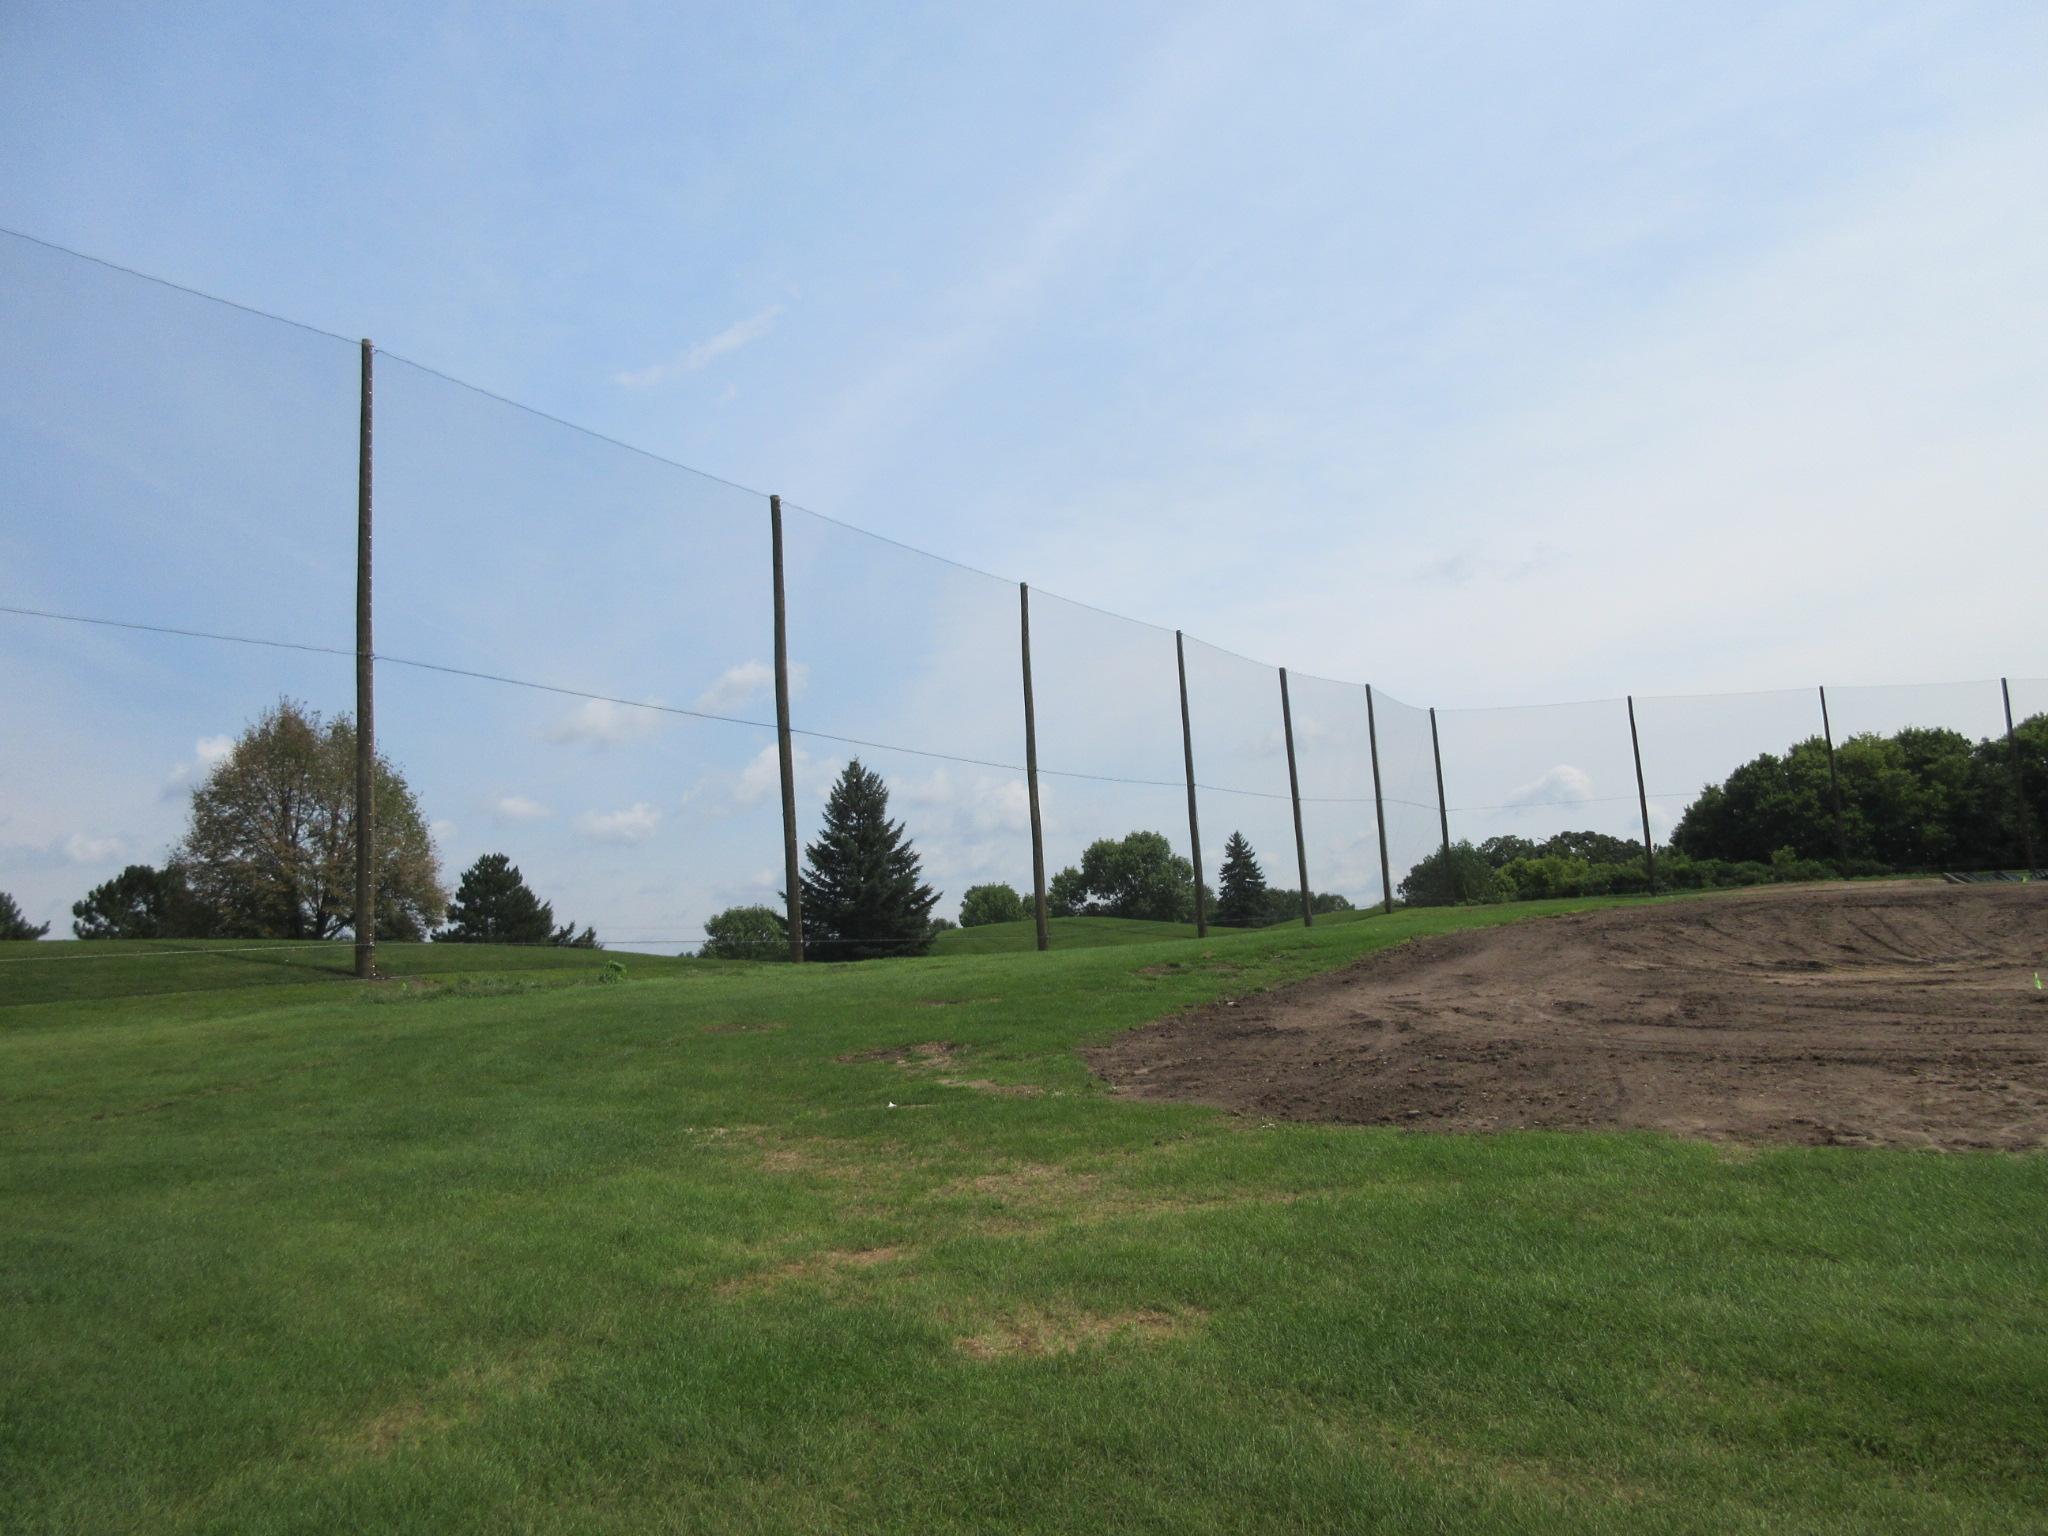 barrier netting u0026 sports lighting installation services grn